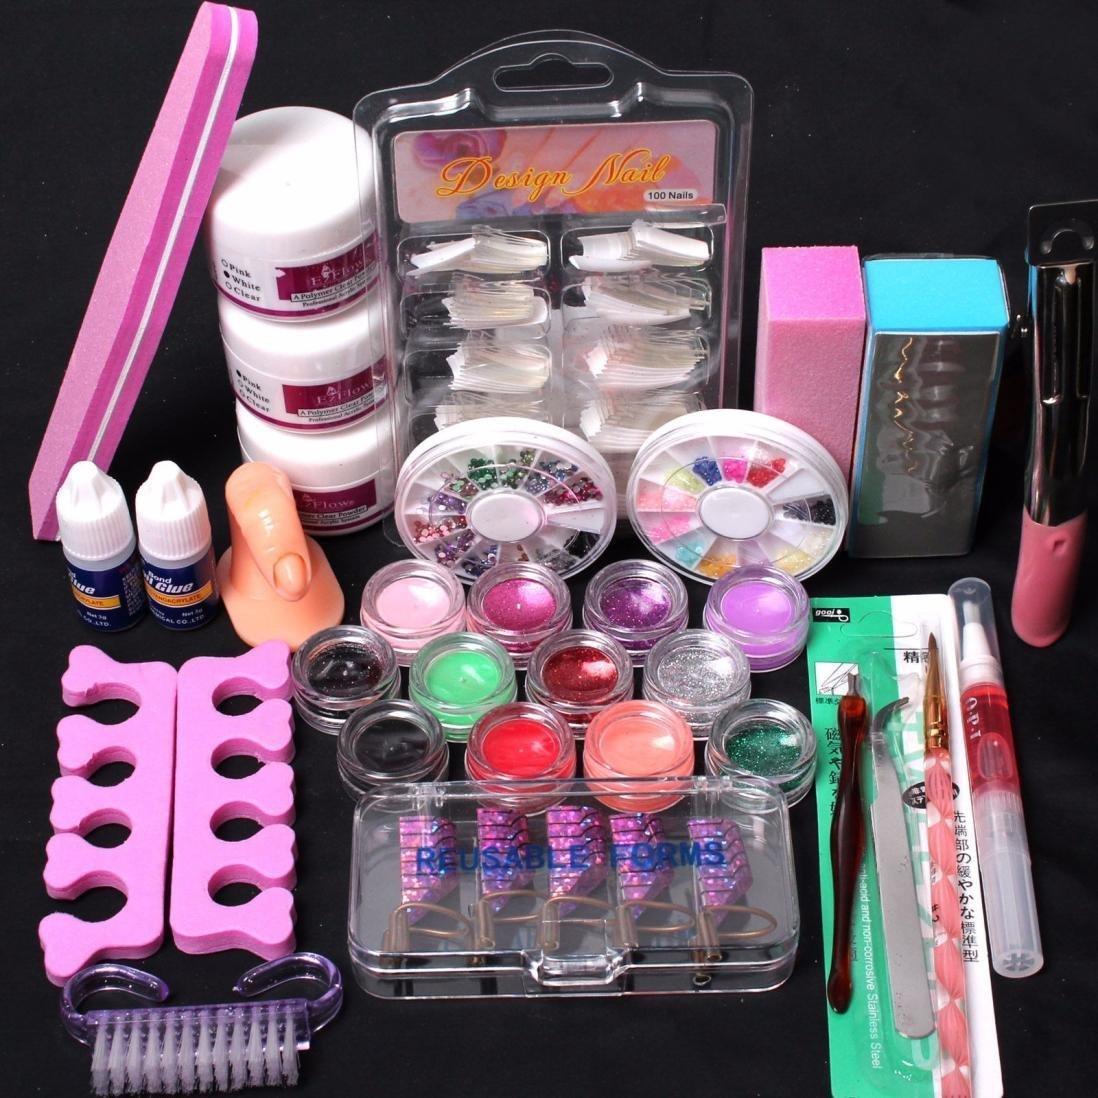 Kolylong® Pro Nail art tools 24 in 1 Acrylic Nail Art Tips Liquid Buffer Glitter Deco Tools Full Kit Set Kolylong-NN